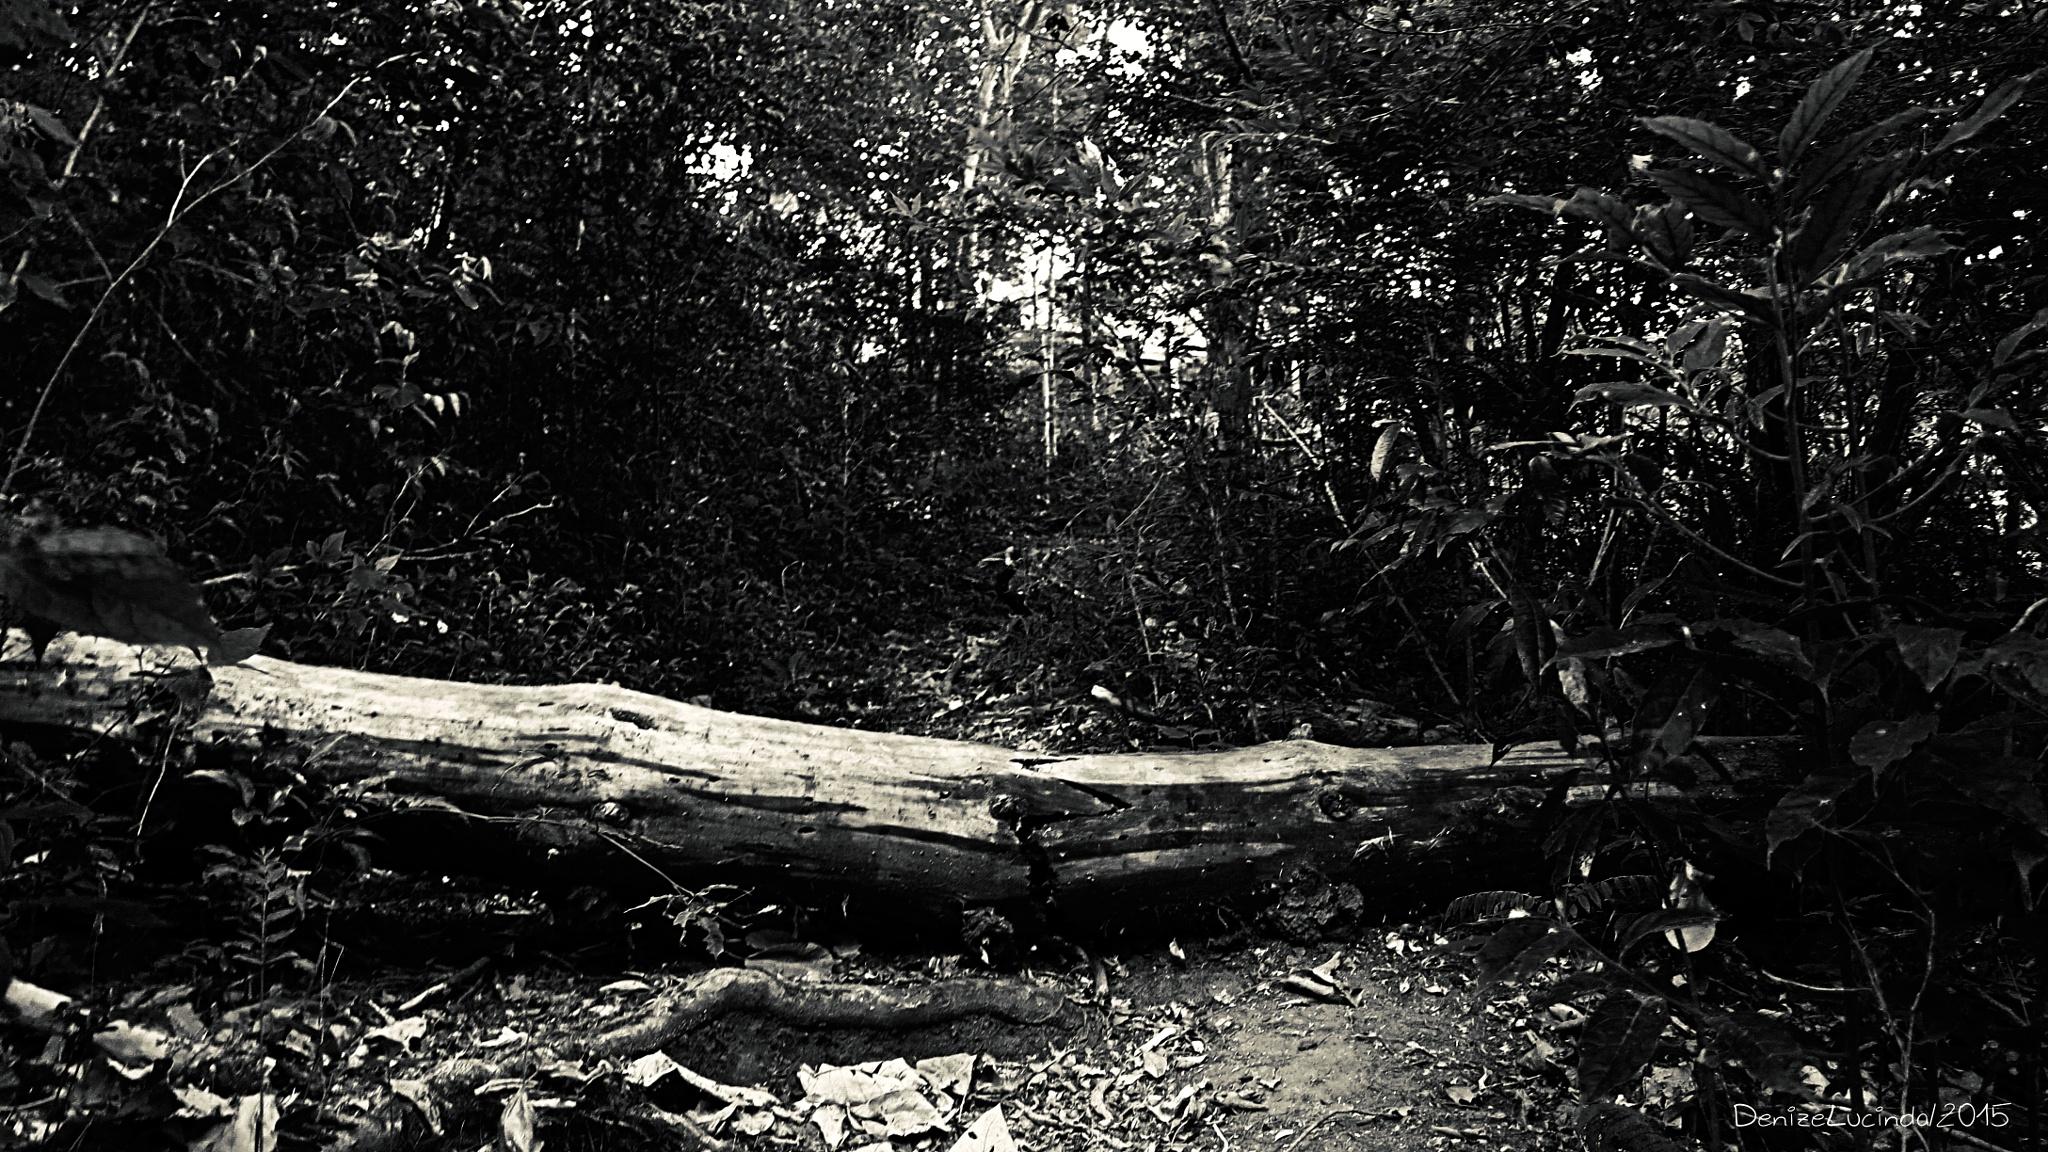 Trilha Ecológica by denizelucinda